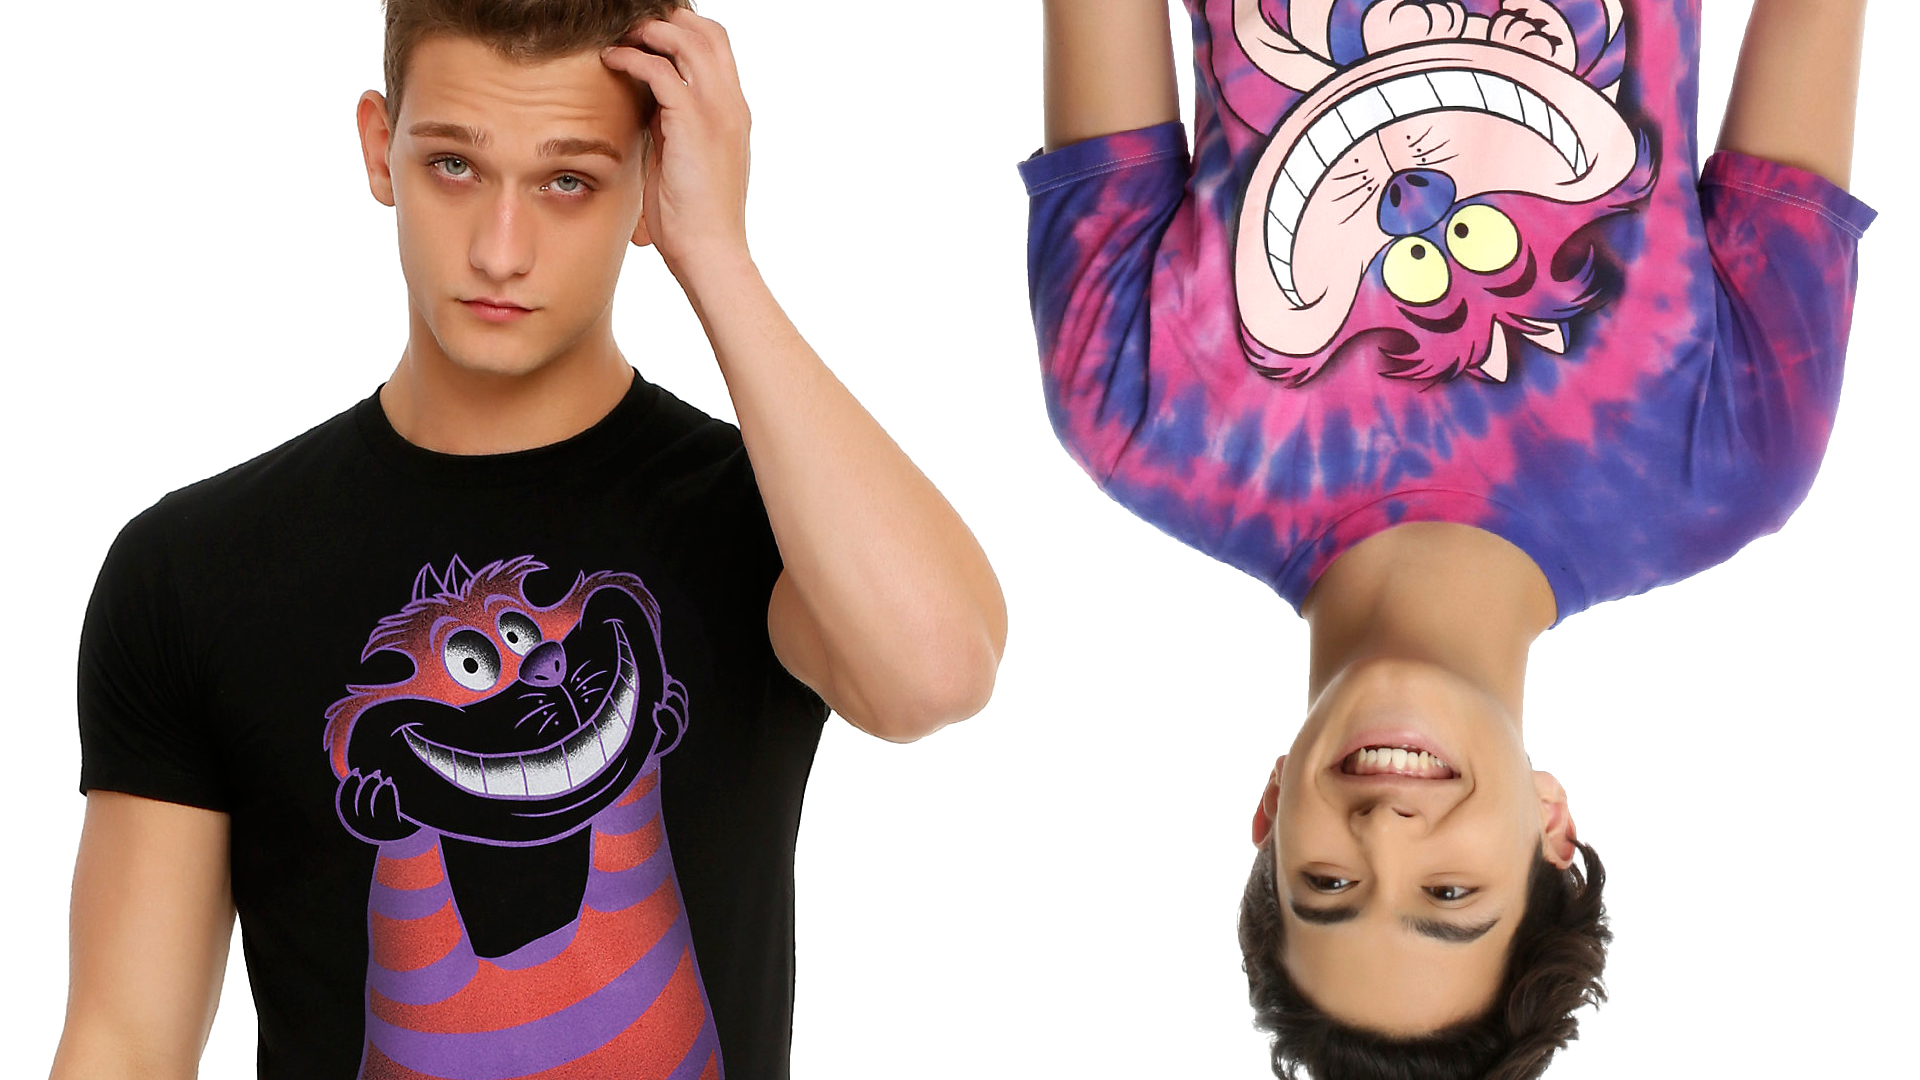 5 Stylish Alice in Wonderland T-Shirts for Men